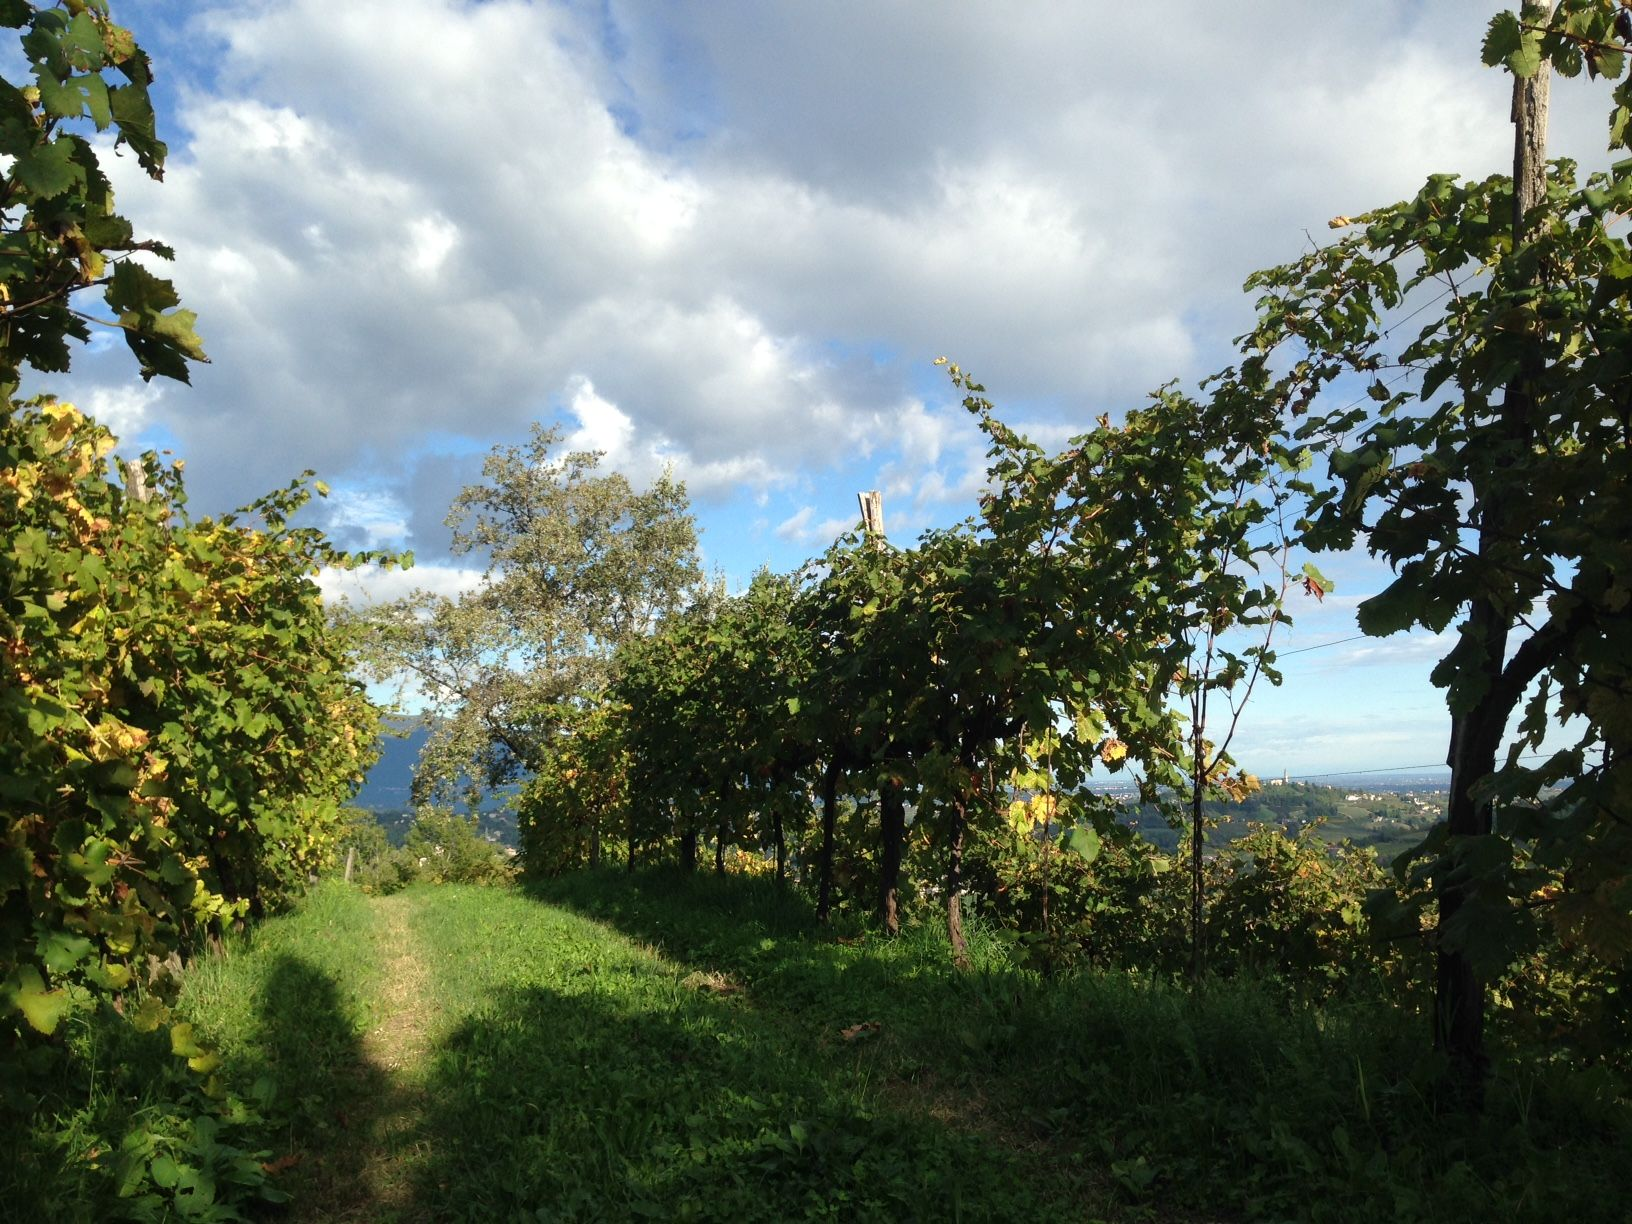 #vigneto #vigna #viti #Natura #autunno2015 #life #story